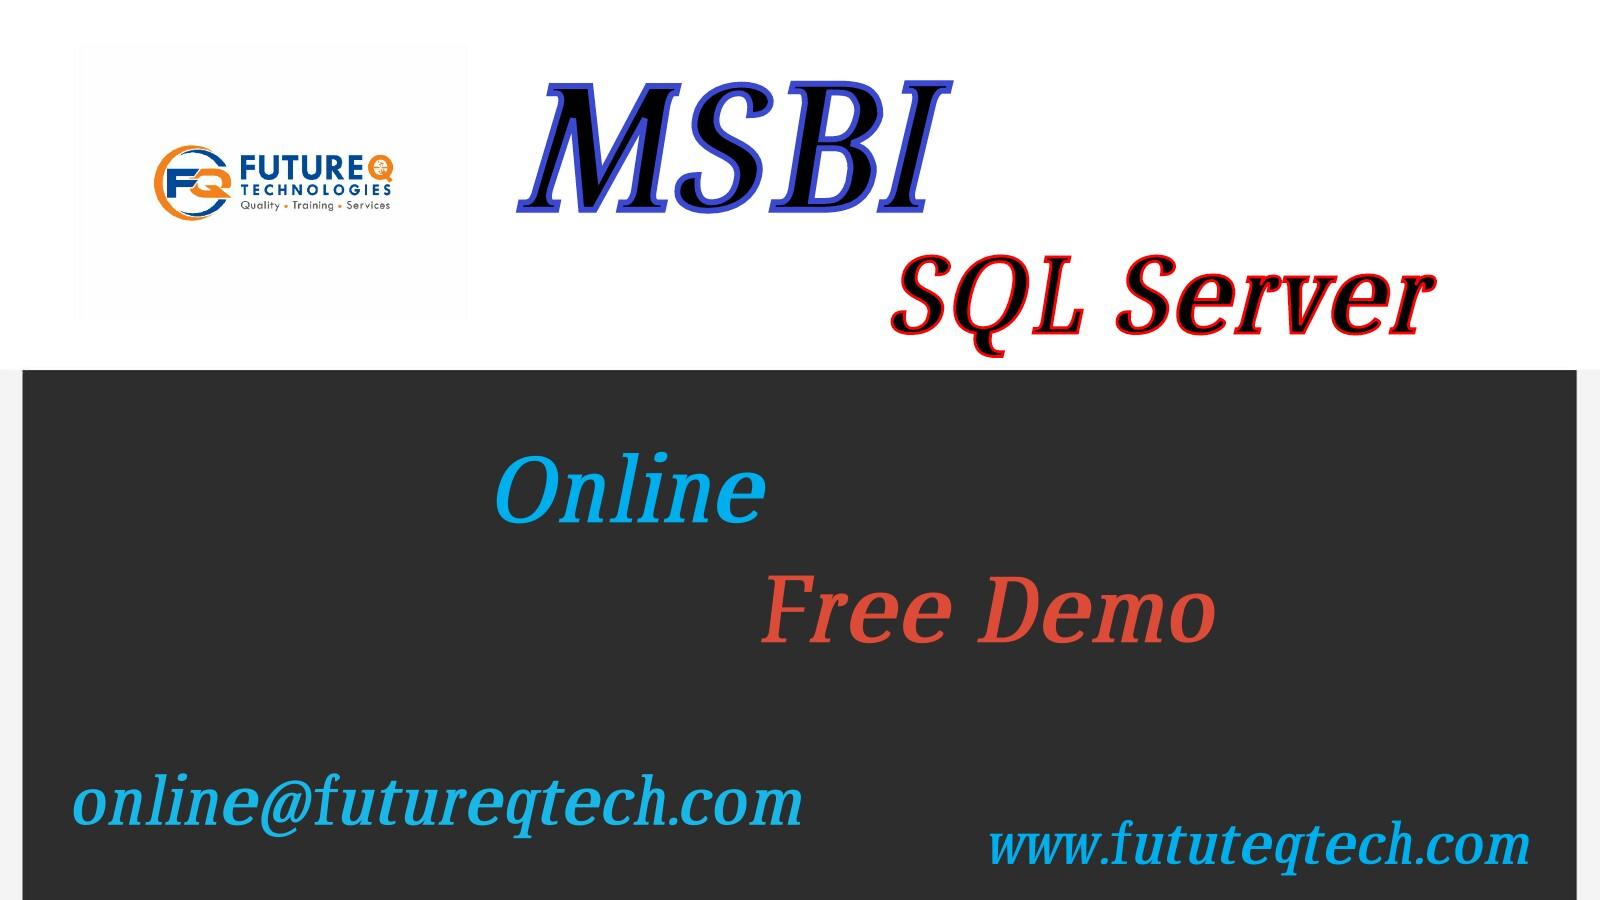 msbi interview question Archives - Future Q Technologies